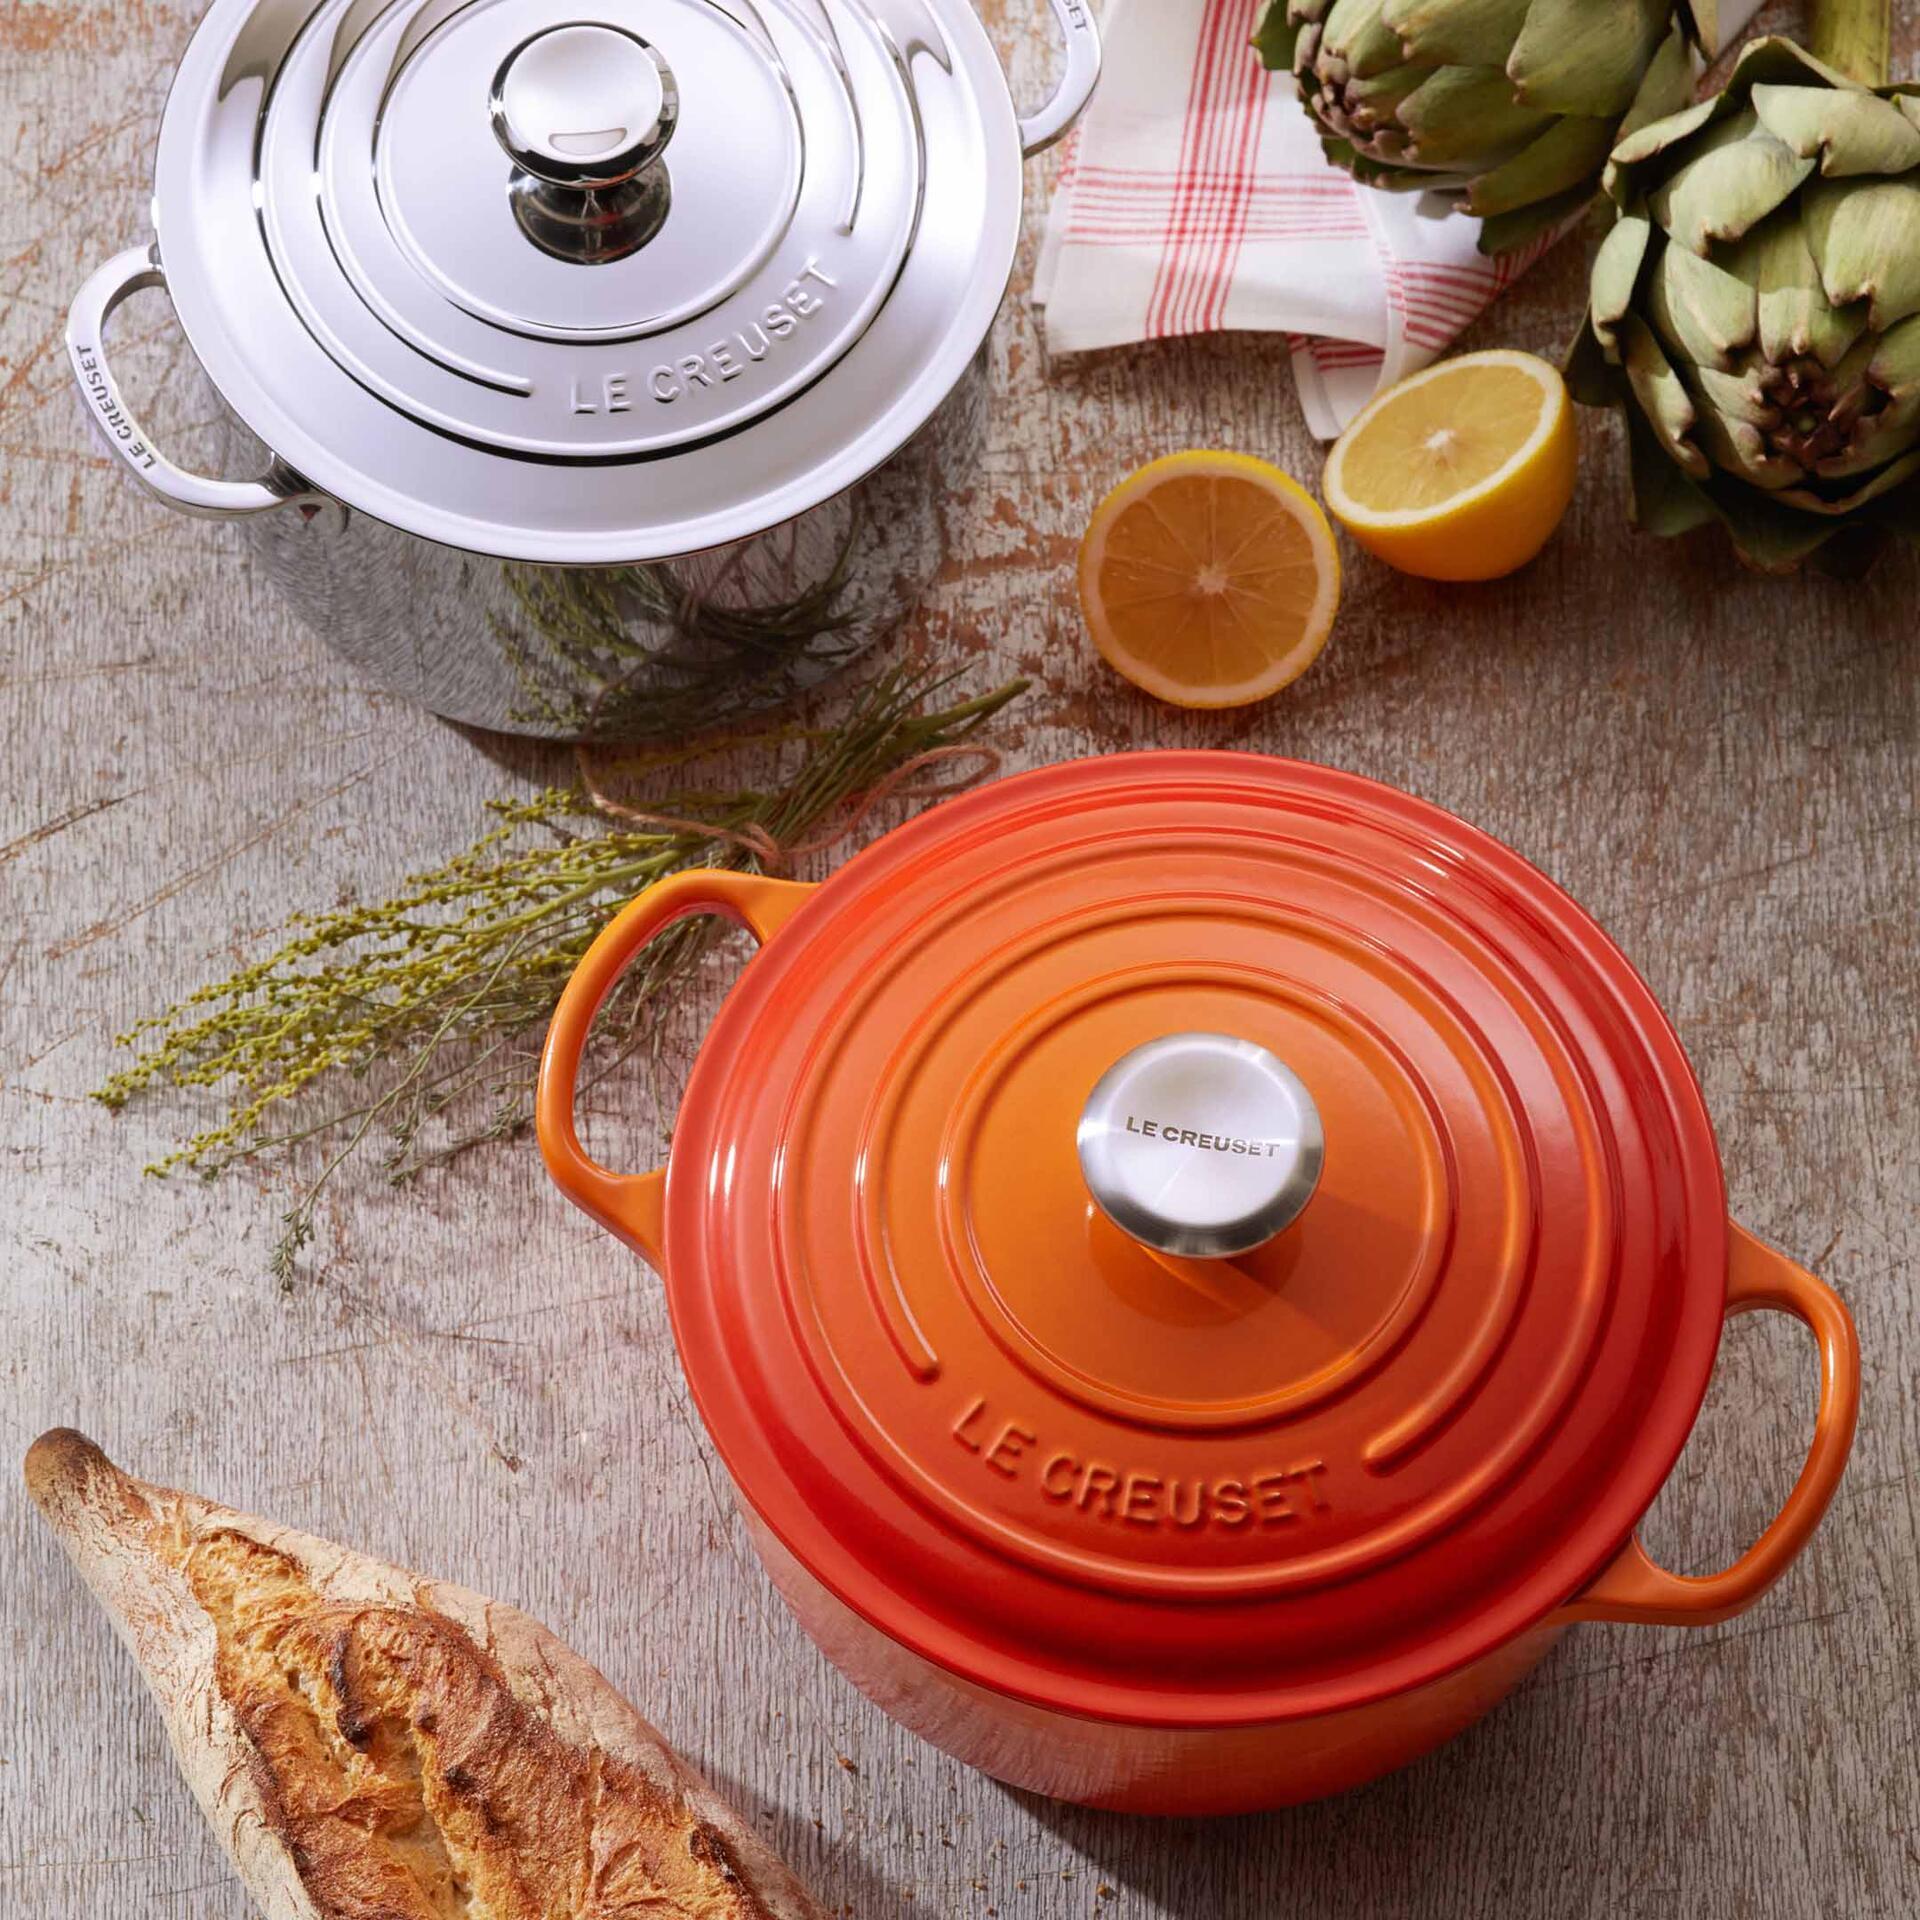 Le Creuset Gourmet-Bräter Signature 30 cm rund Ultra Violet 3,5 L